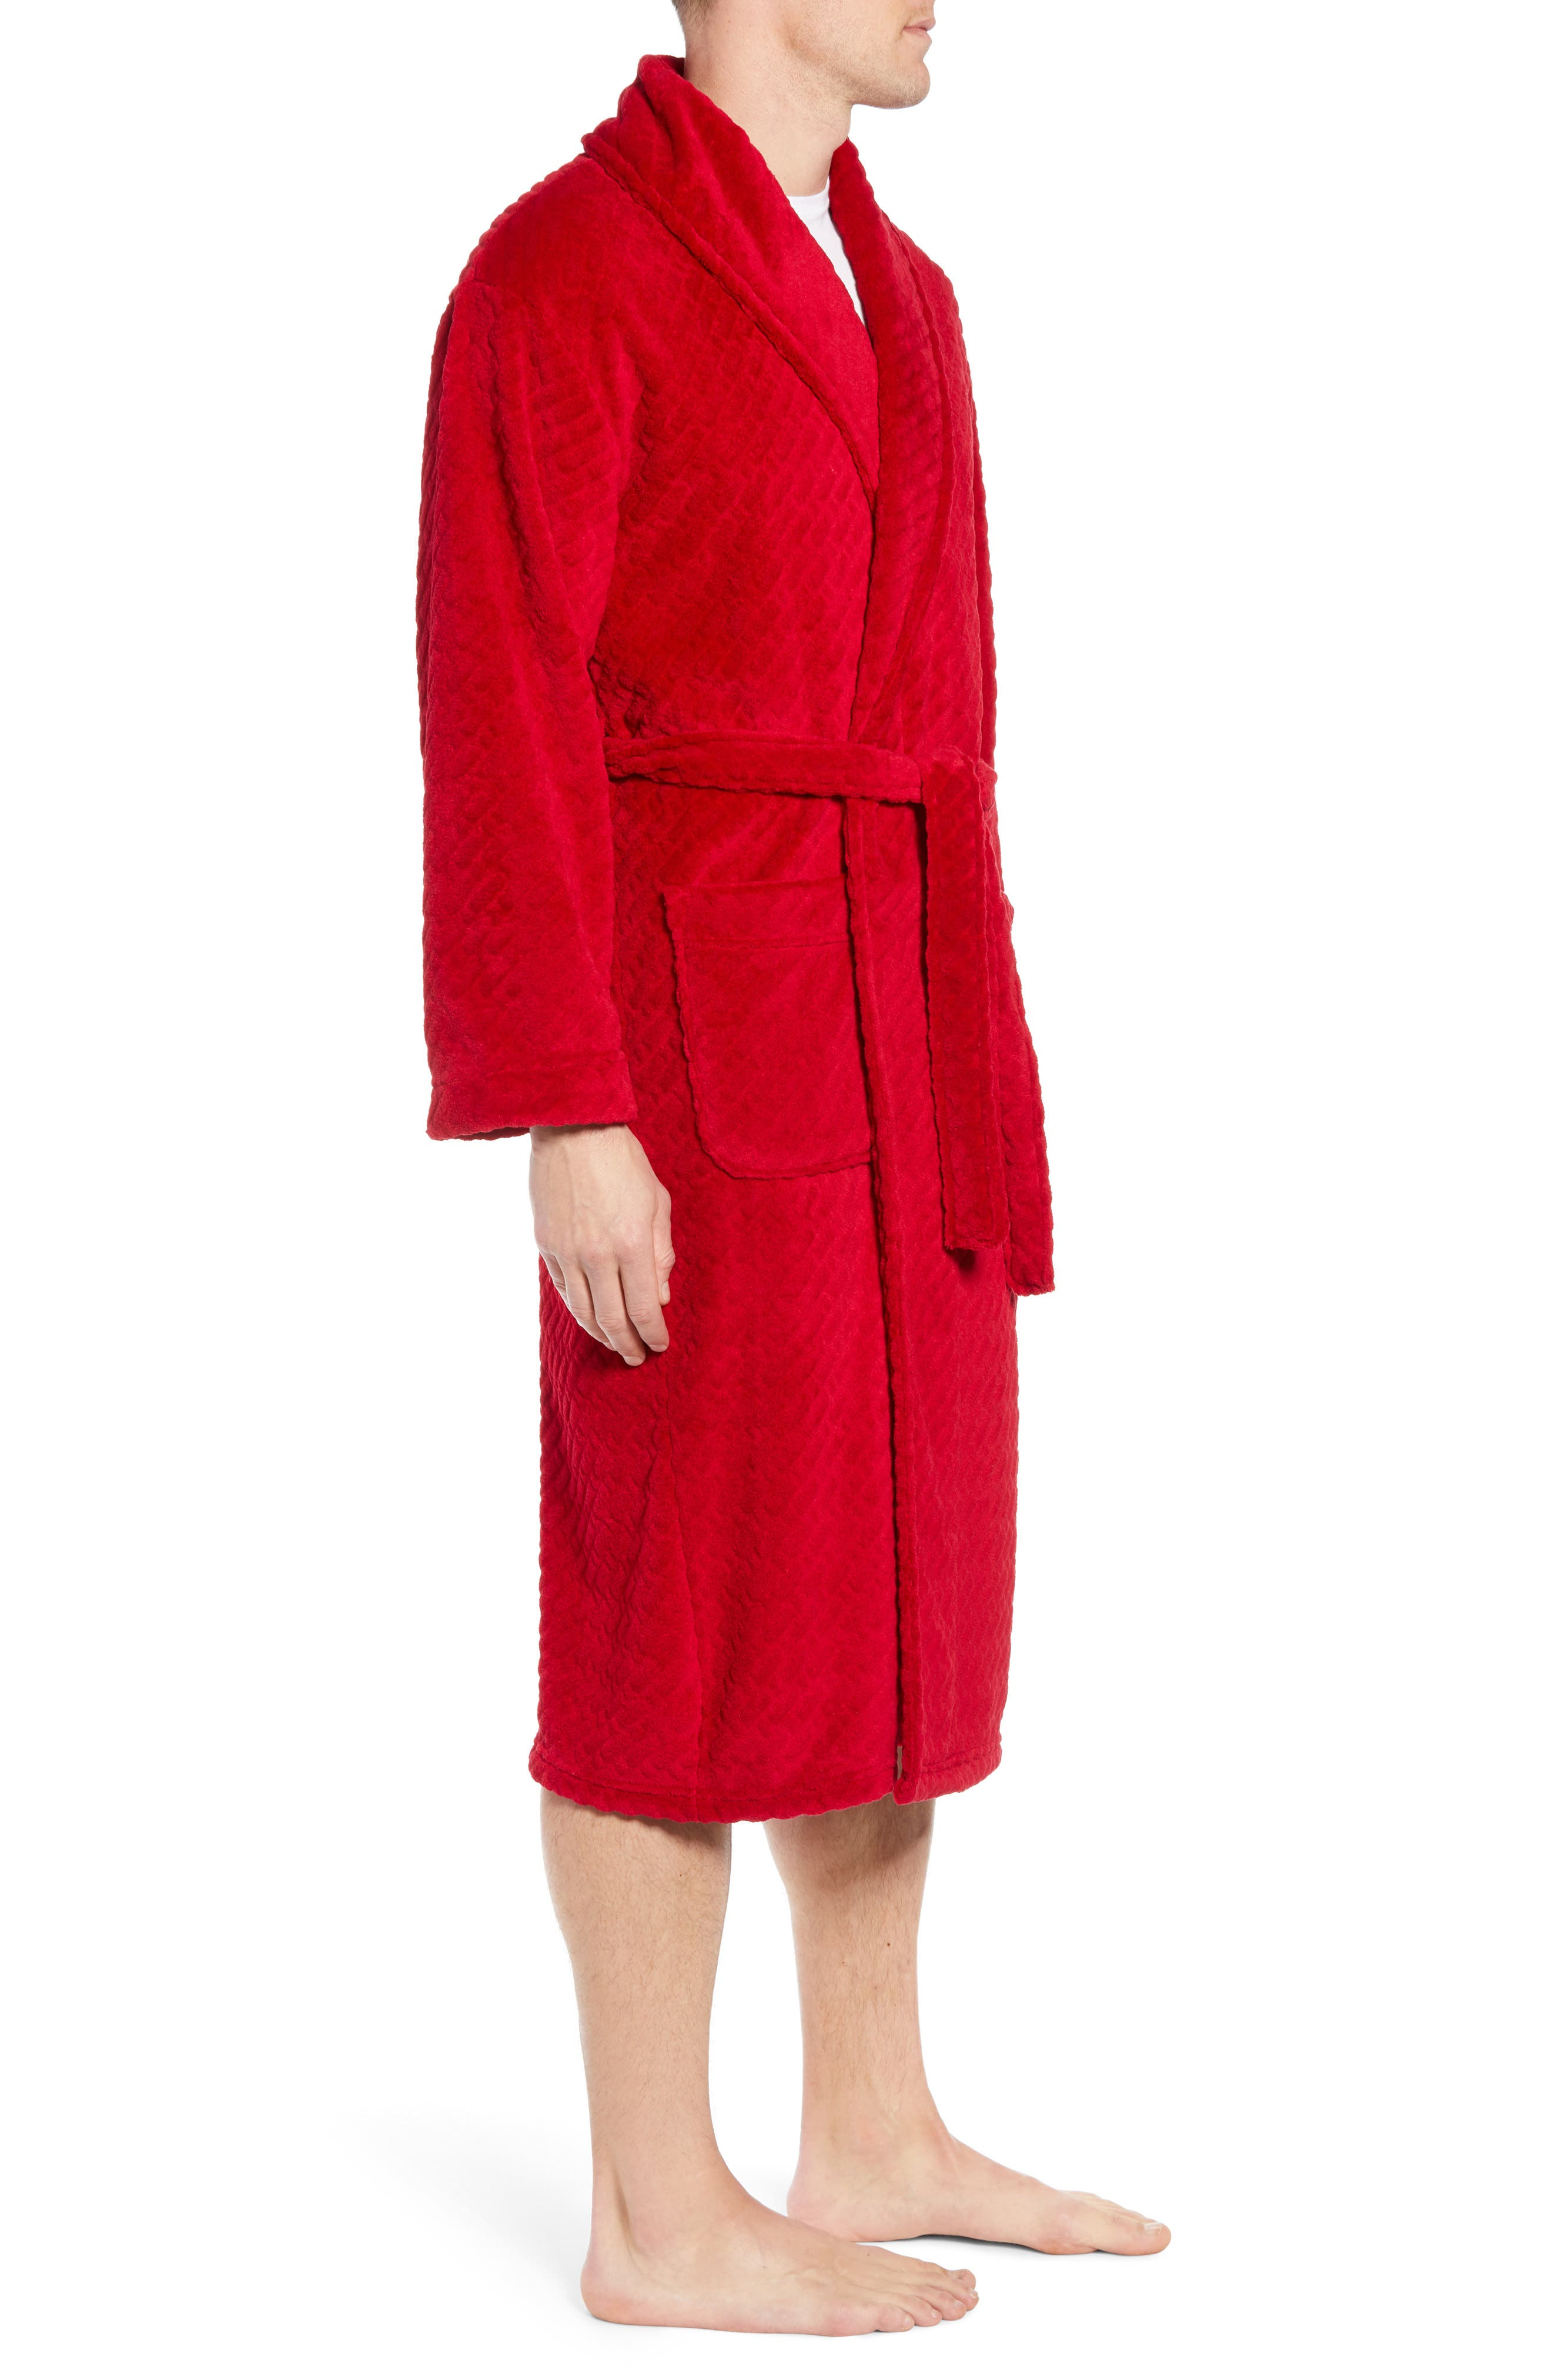 MAJESTIC INTERNATIONAL, Fireside Fleece Robe, Alternate thumbnail 3, color, RED RIBBON